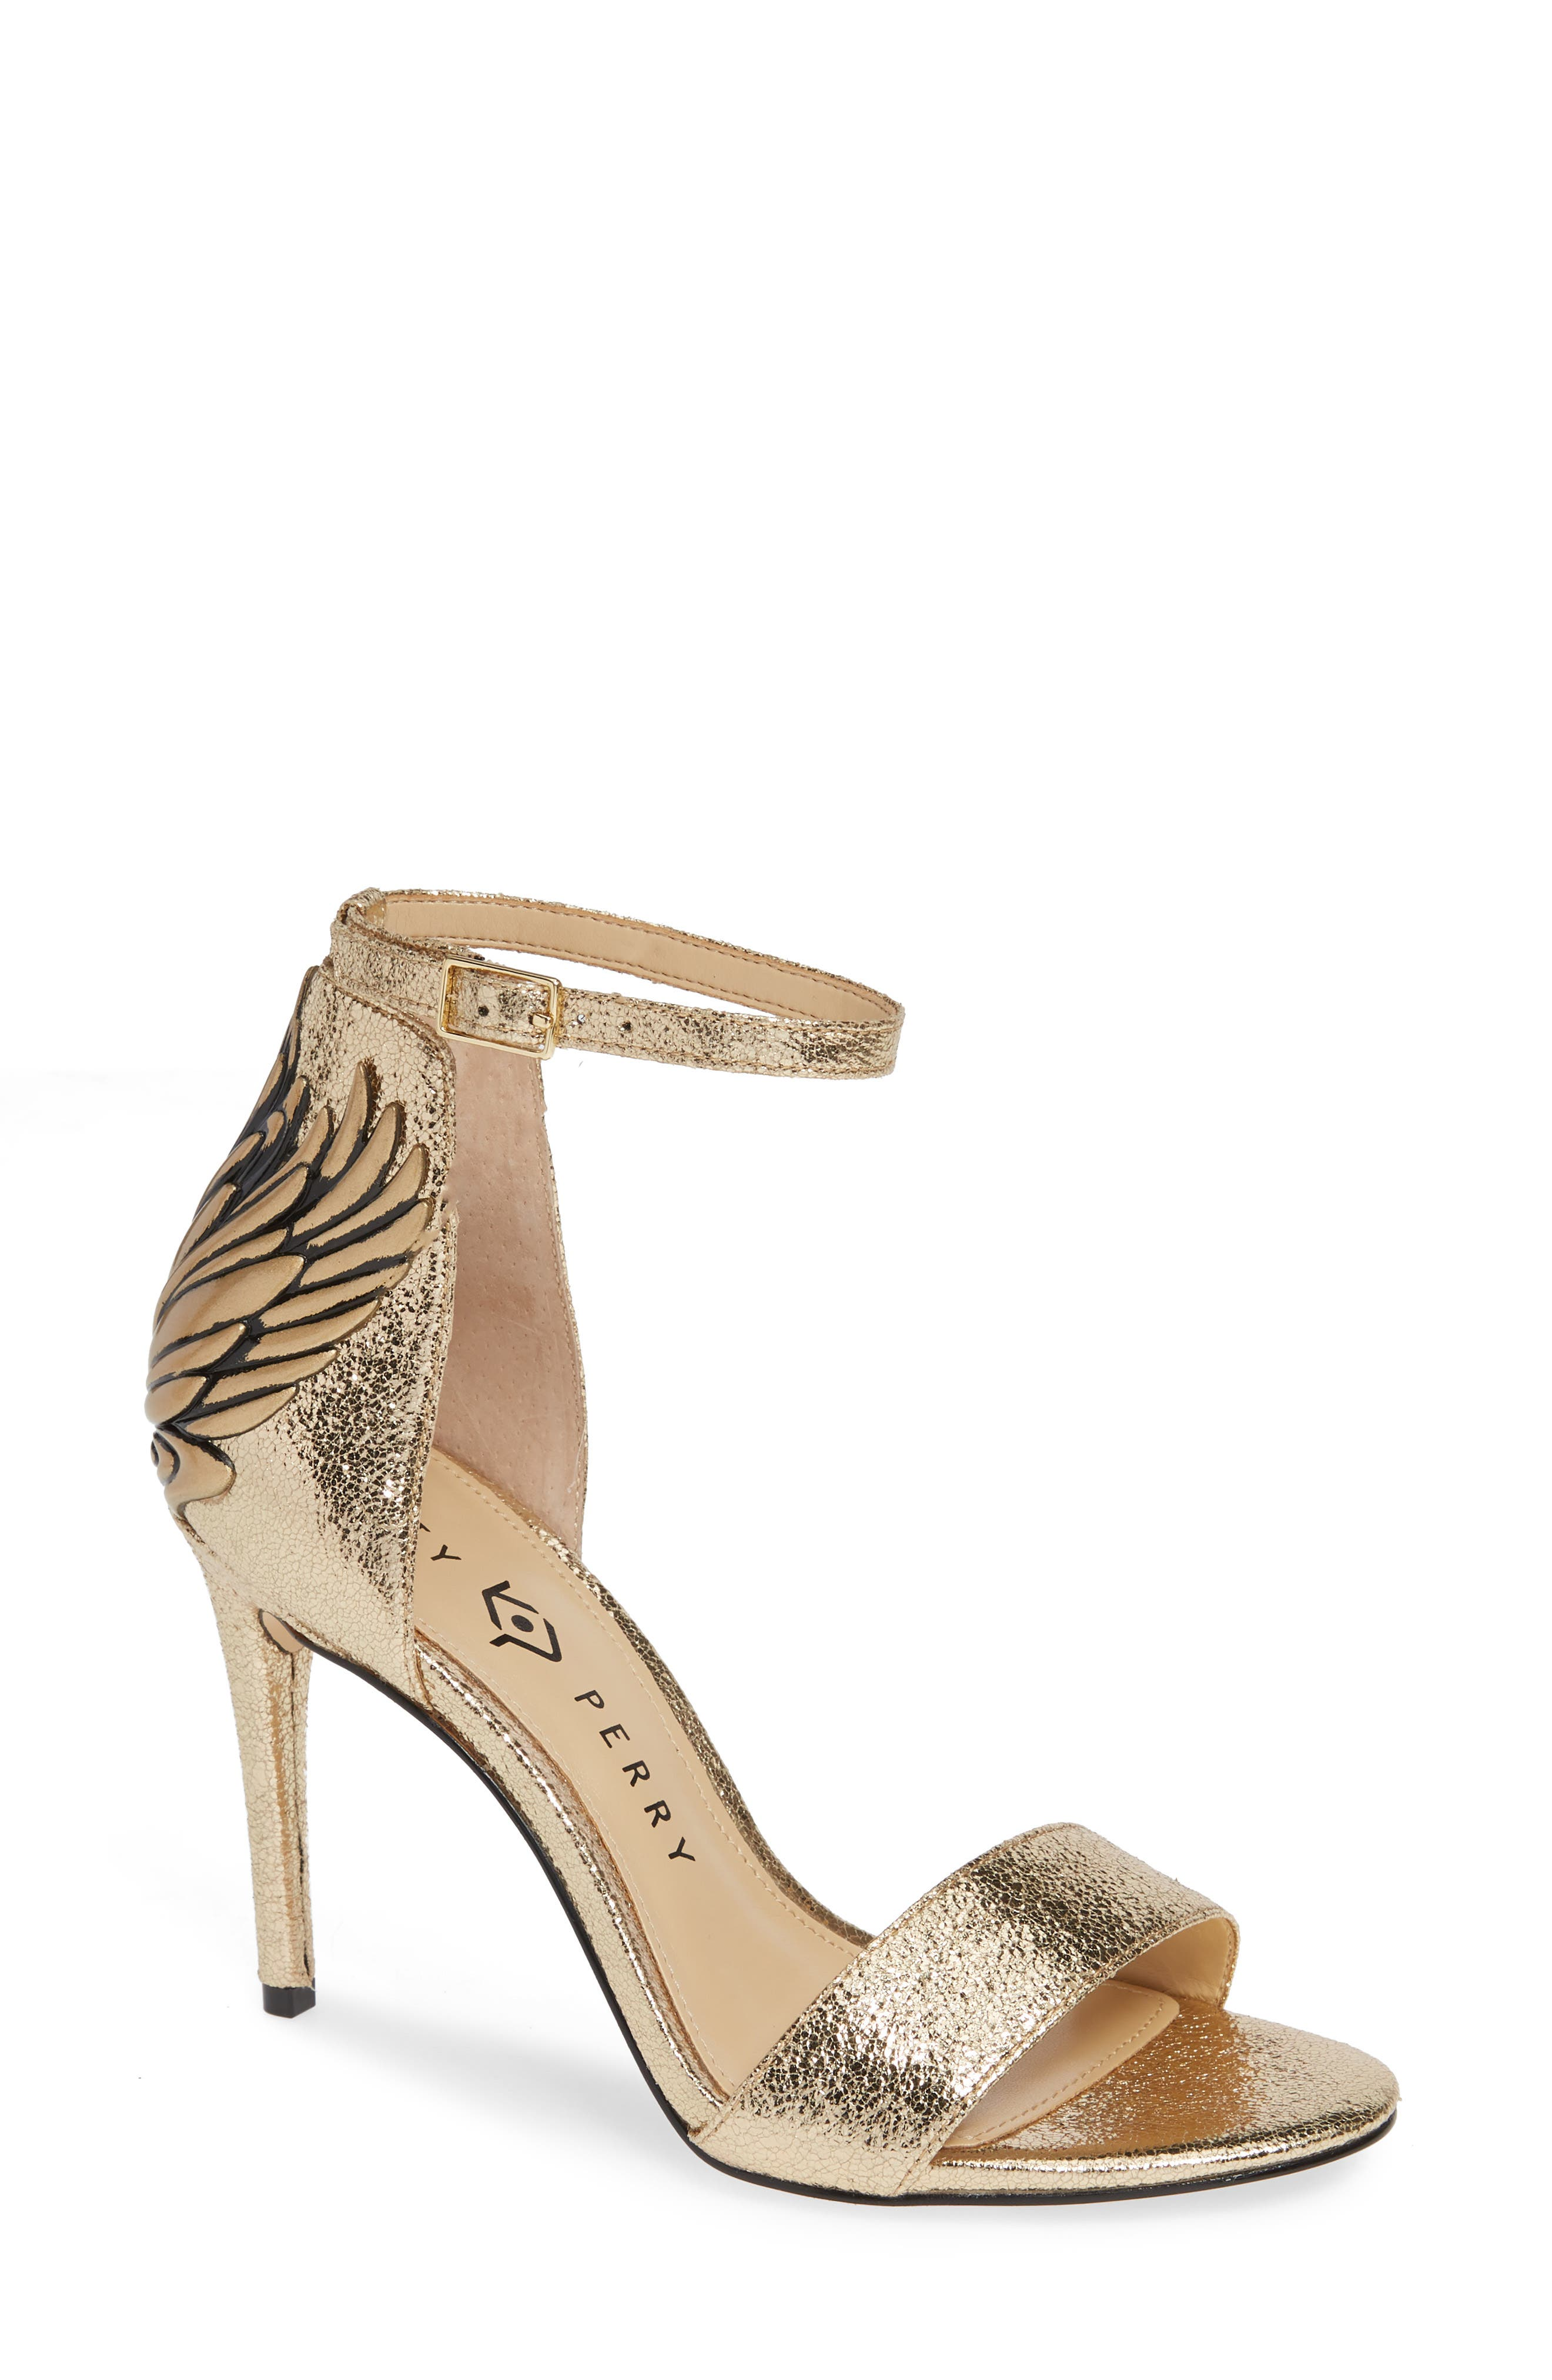 Katy Perry Ankle Strap Sandal, Metallic